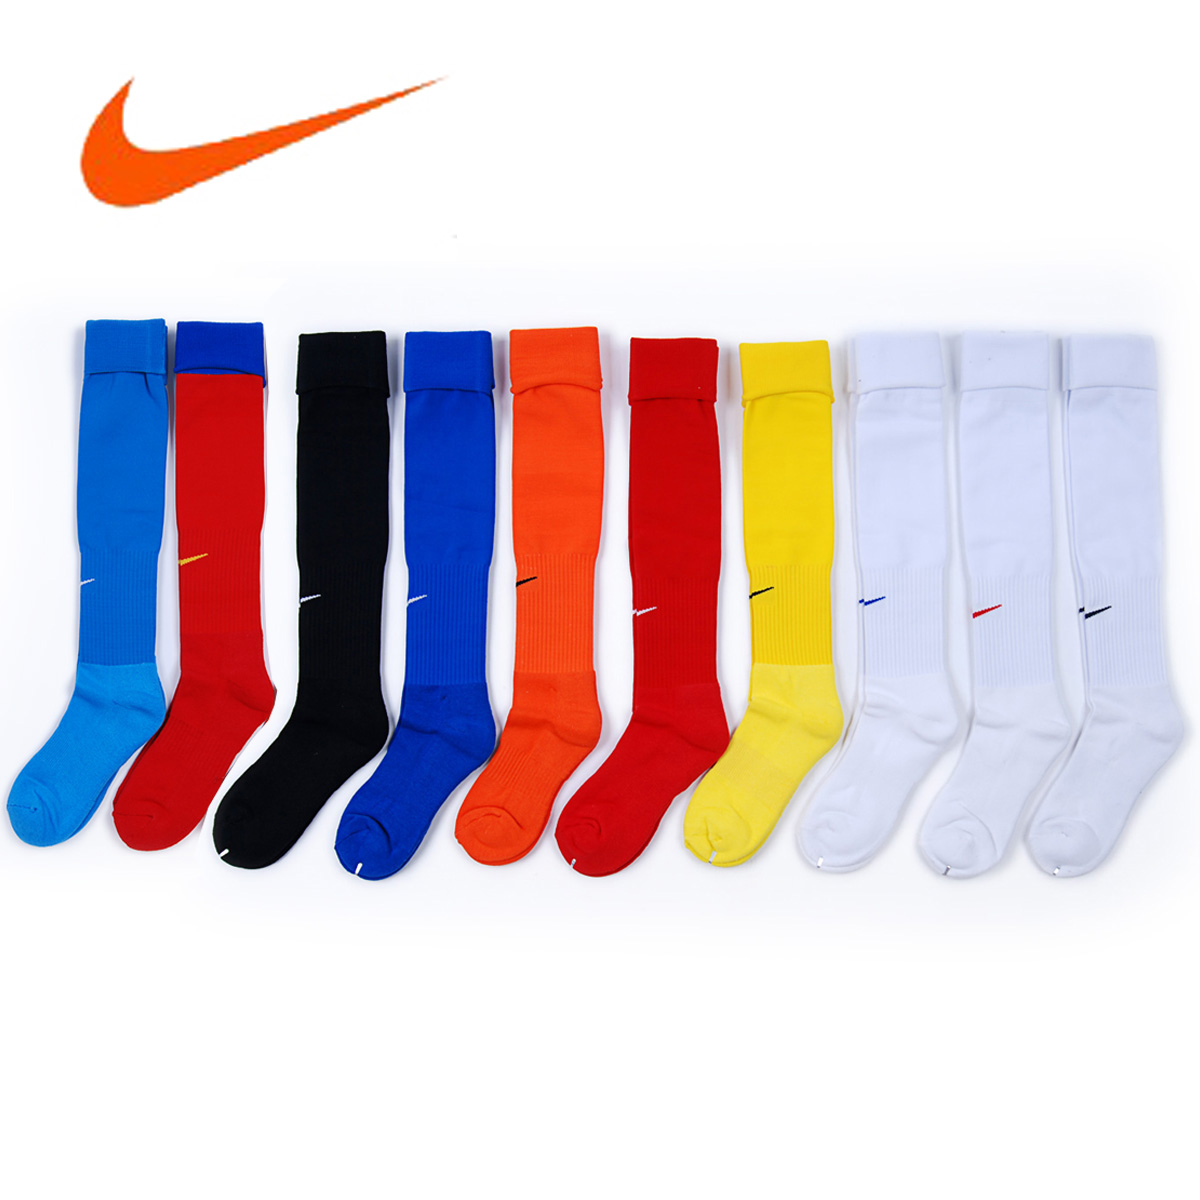 гетры Nike SX3141 nike дорожка координационная nike accessories